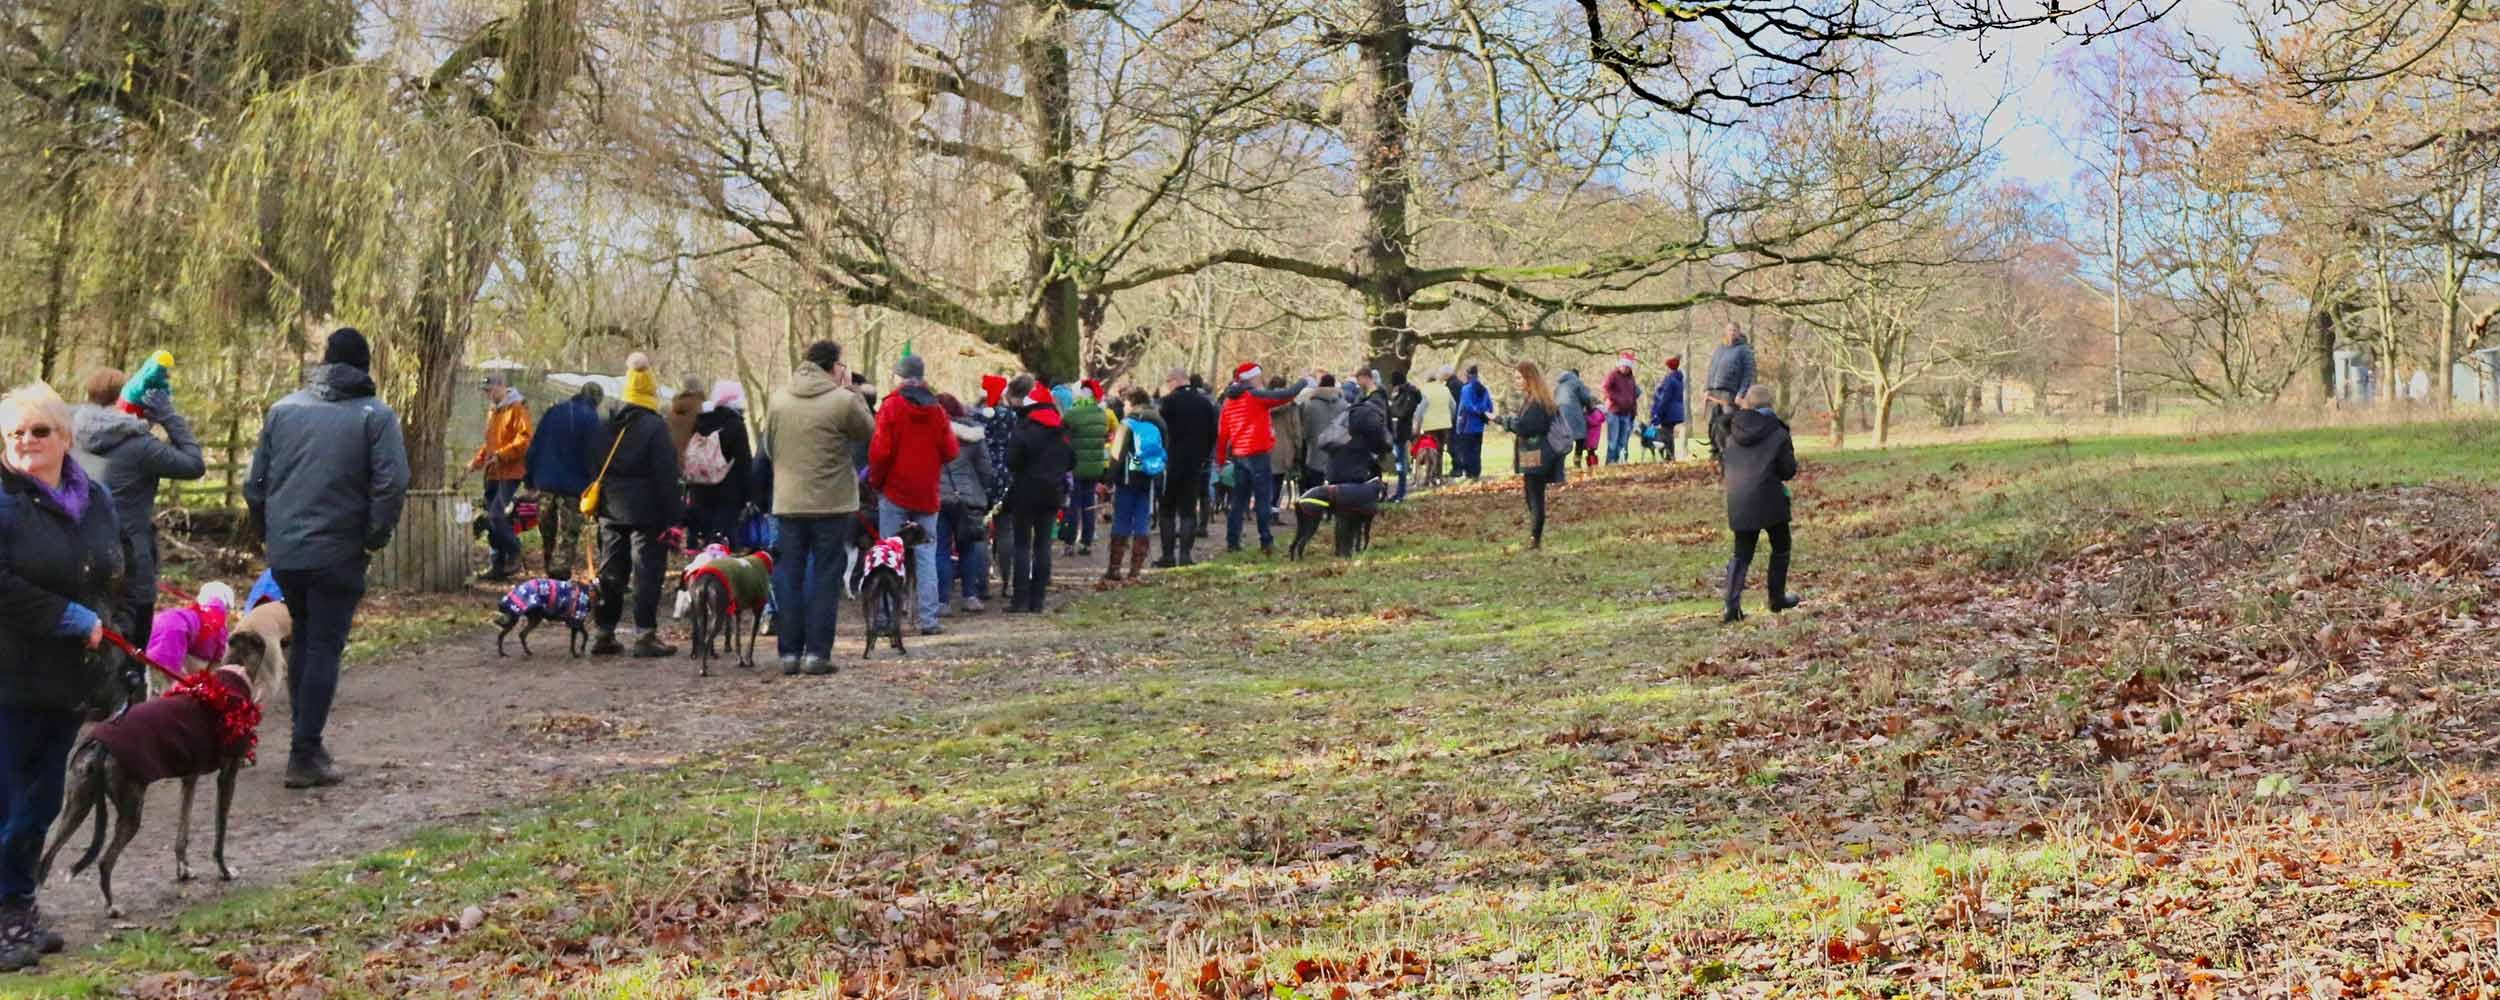 Sighthound Walks at Yorkshire Sculpture Park